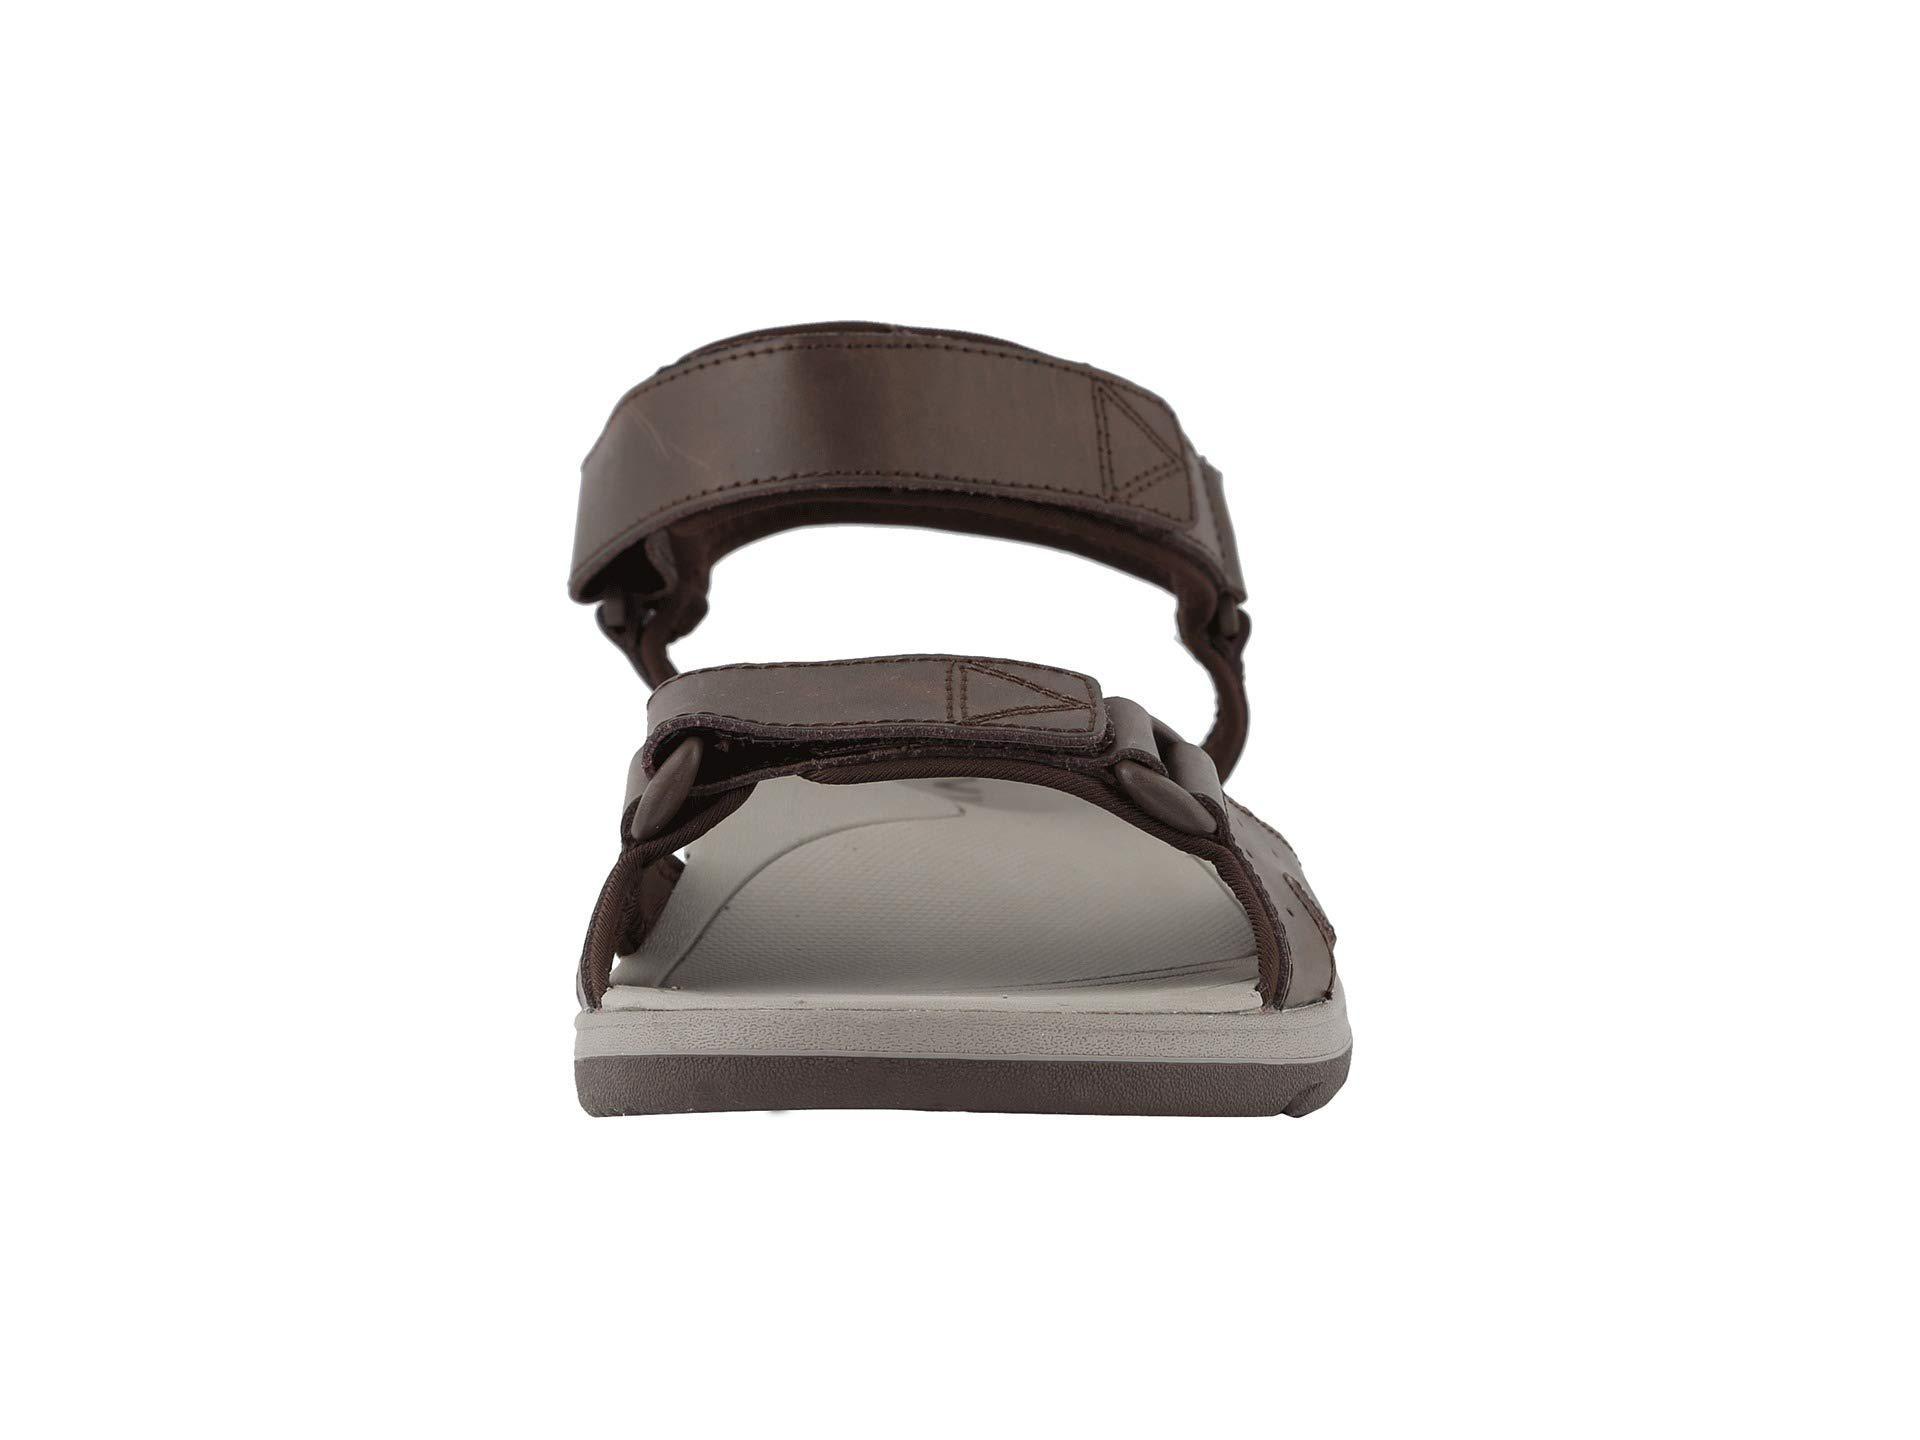 63f02ef9505a Vionic - Brown Leo (black) Men s Sandals for Men - Lyst. View fullscreen